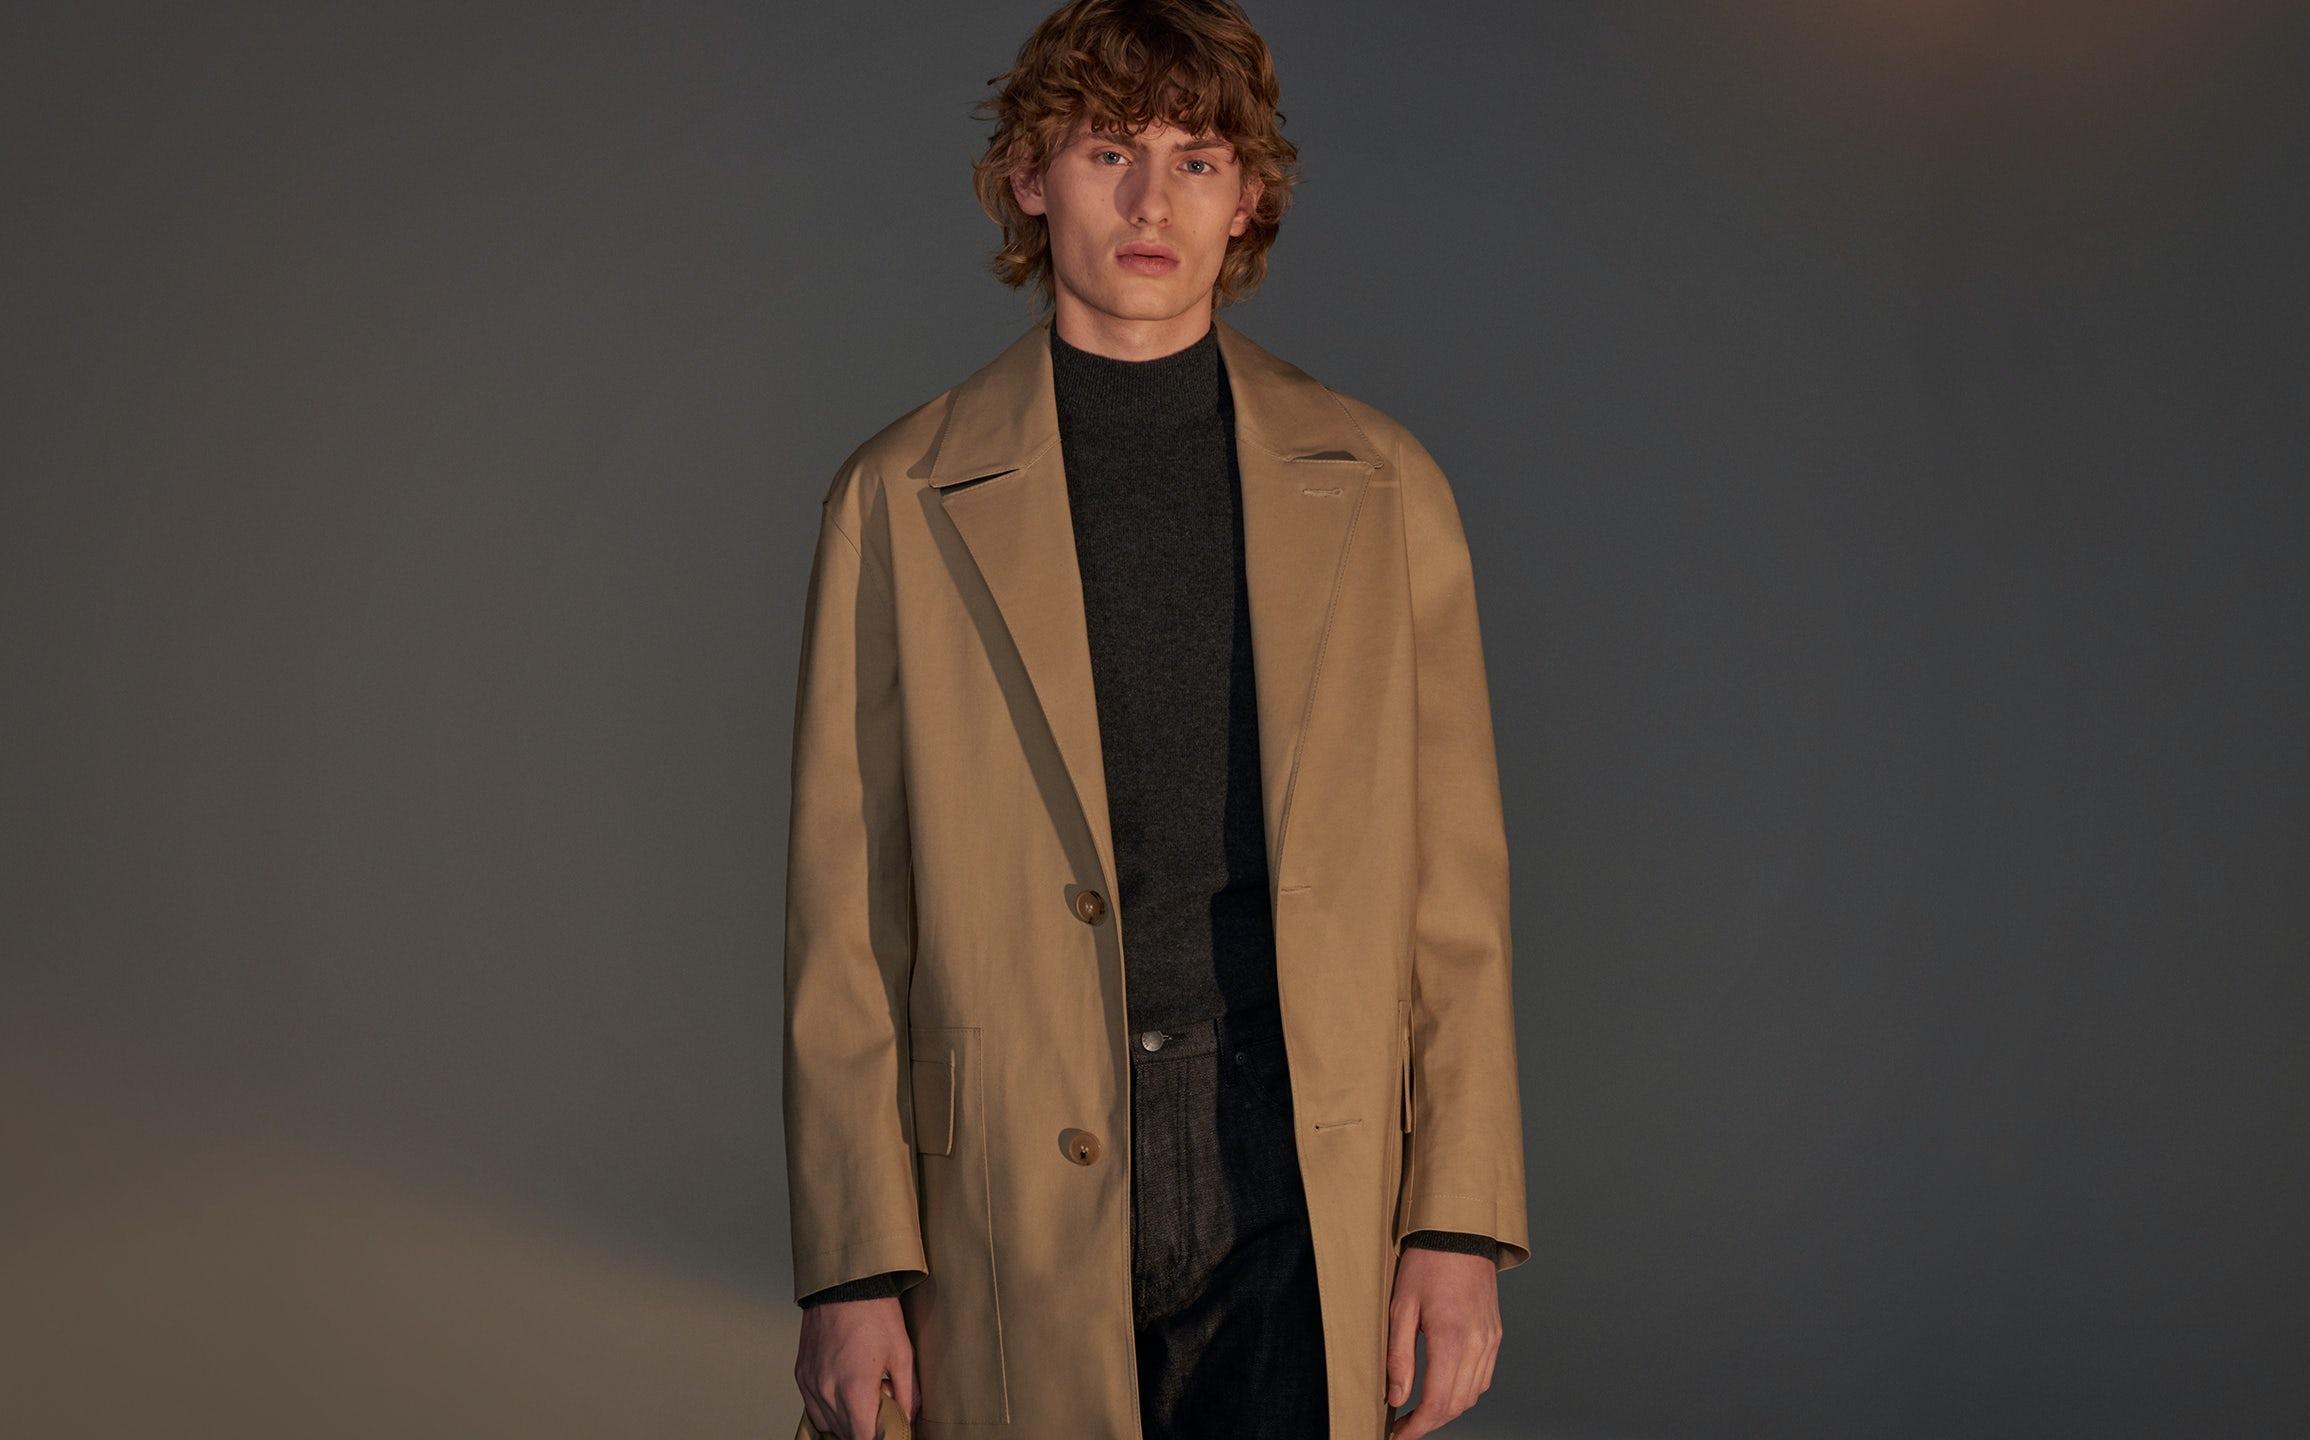 Profile image for Mackintosh